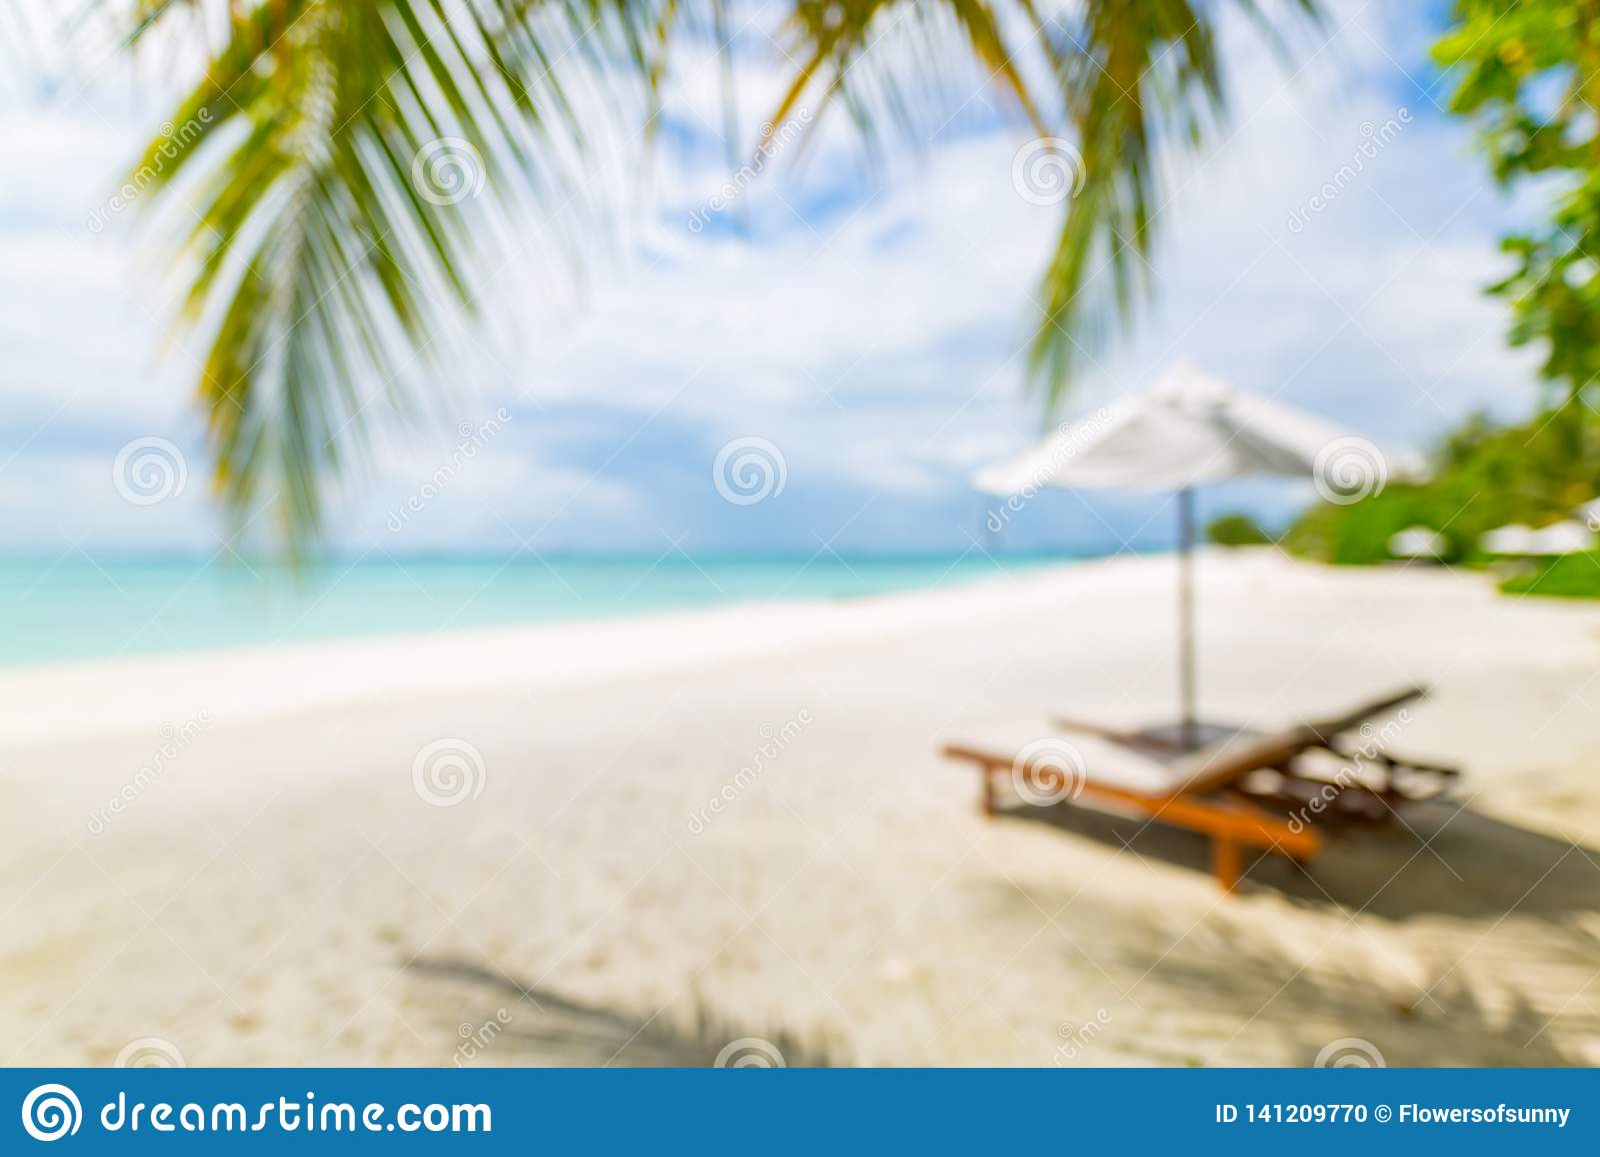 Blur Of Tranquil Beach Scene Blurry Exotic Tropical Beach